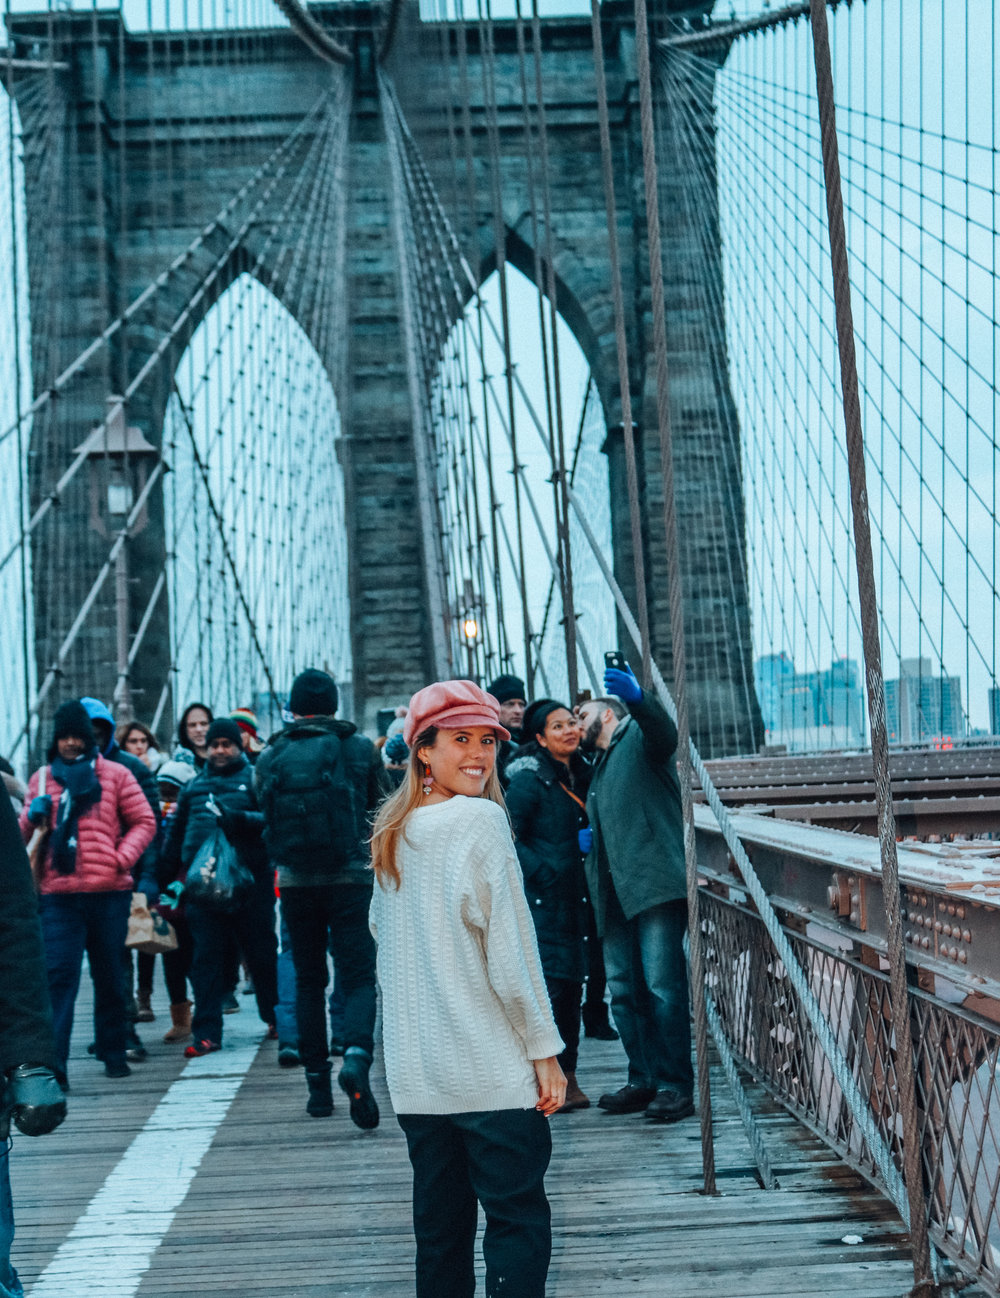 NYC+Brooklyn+Bridge.jpg